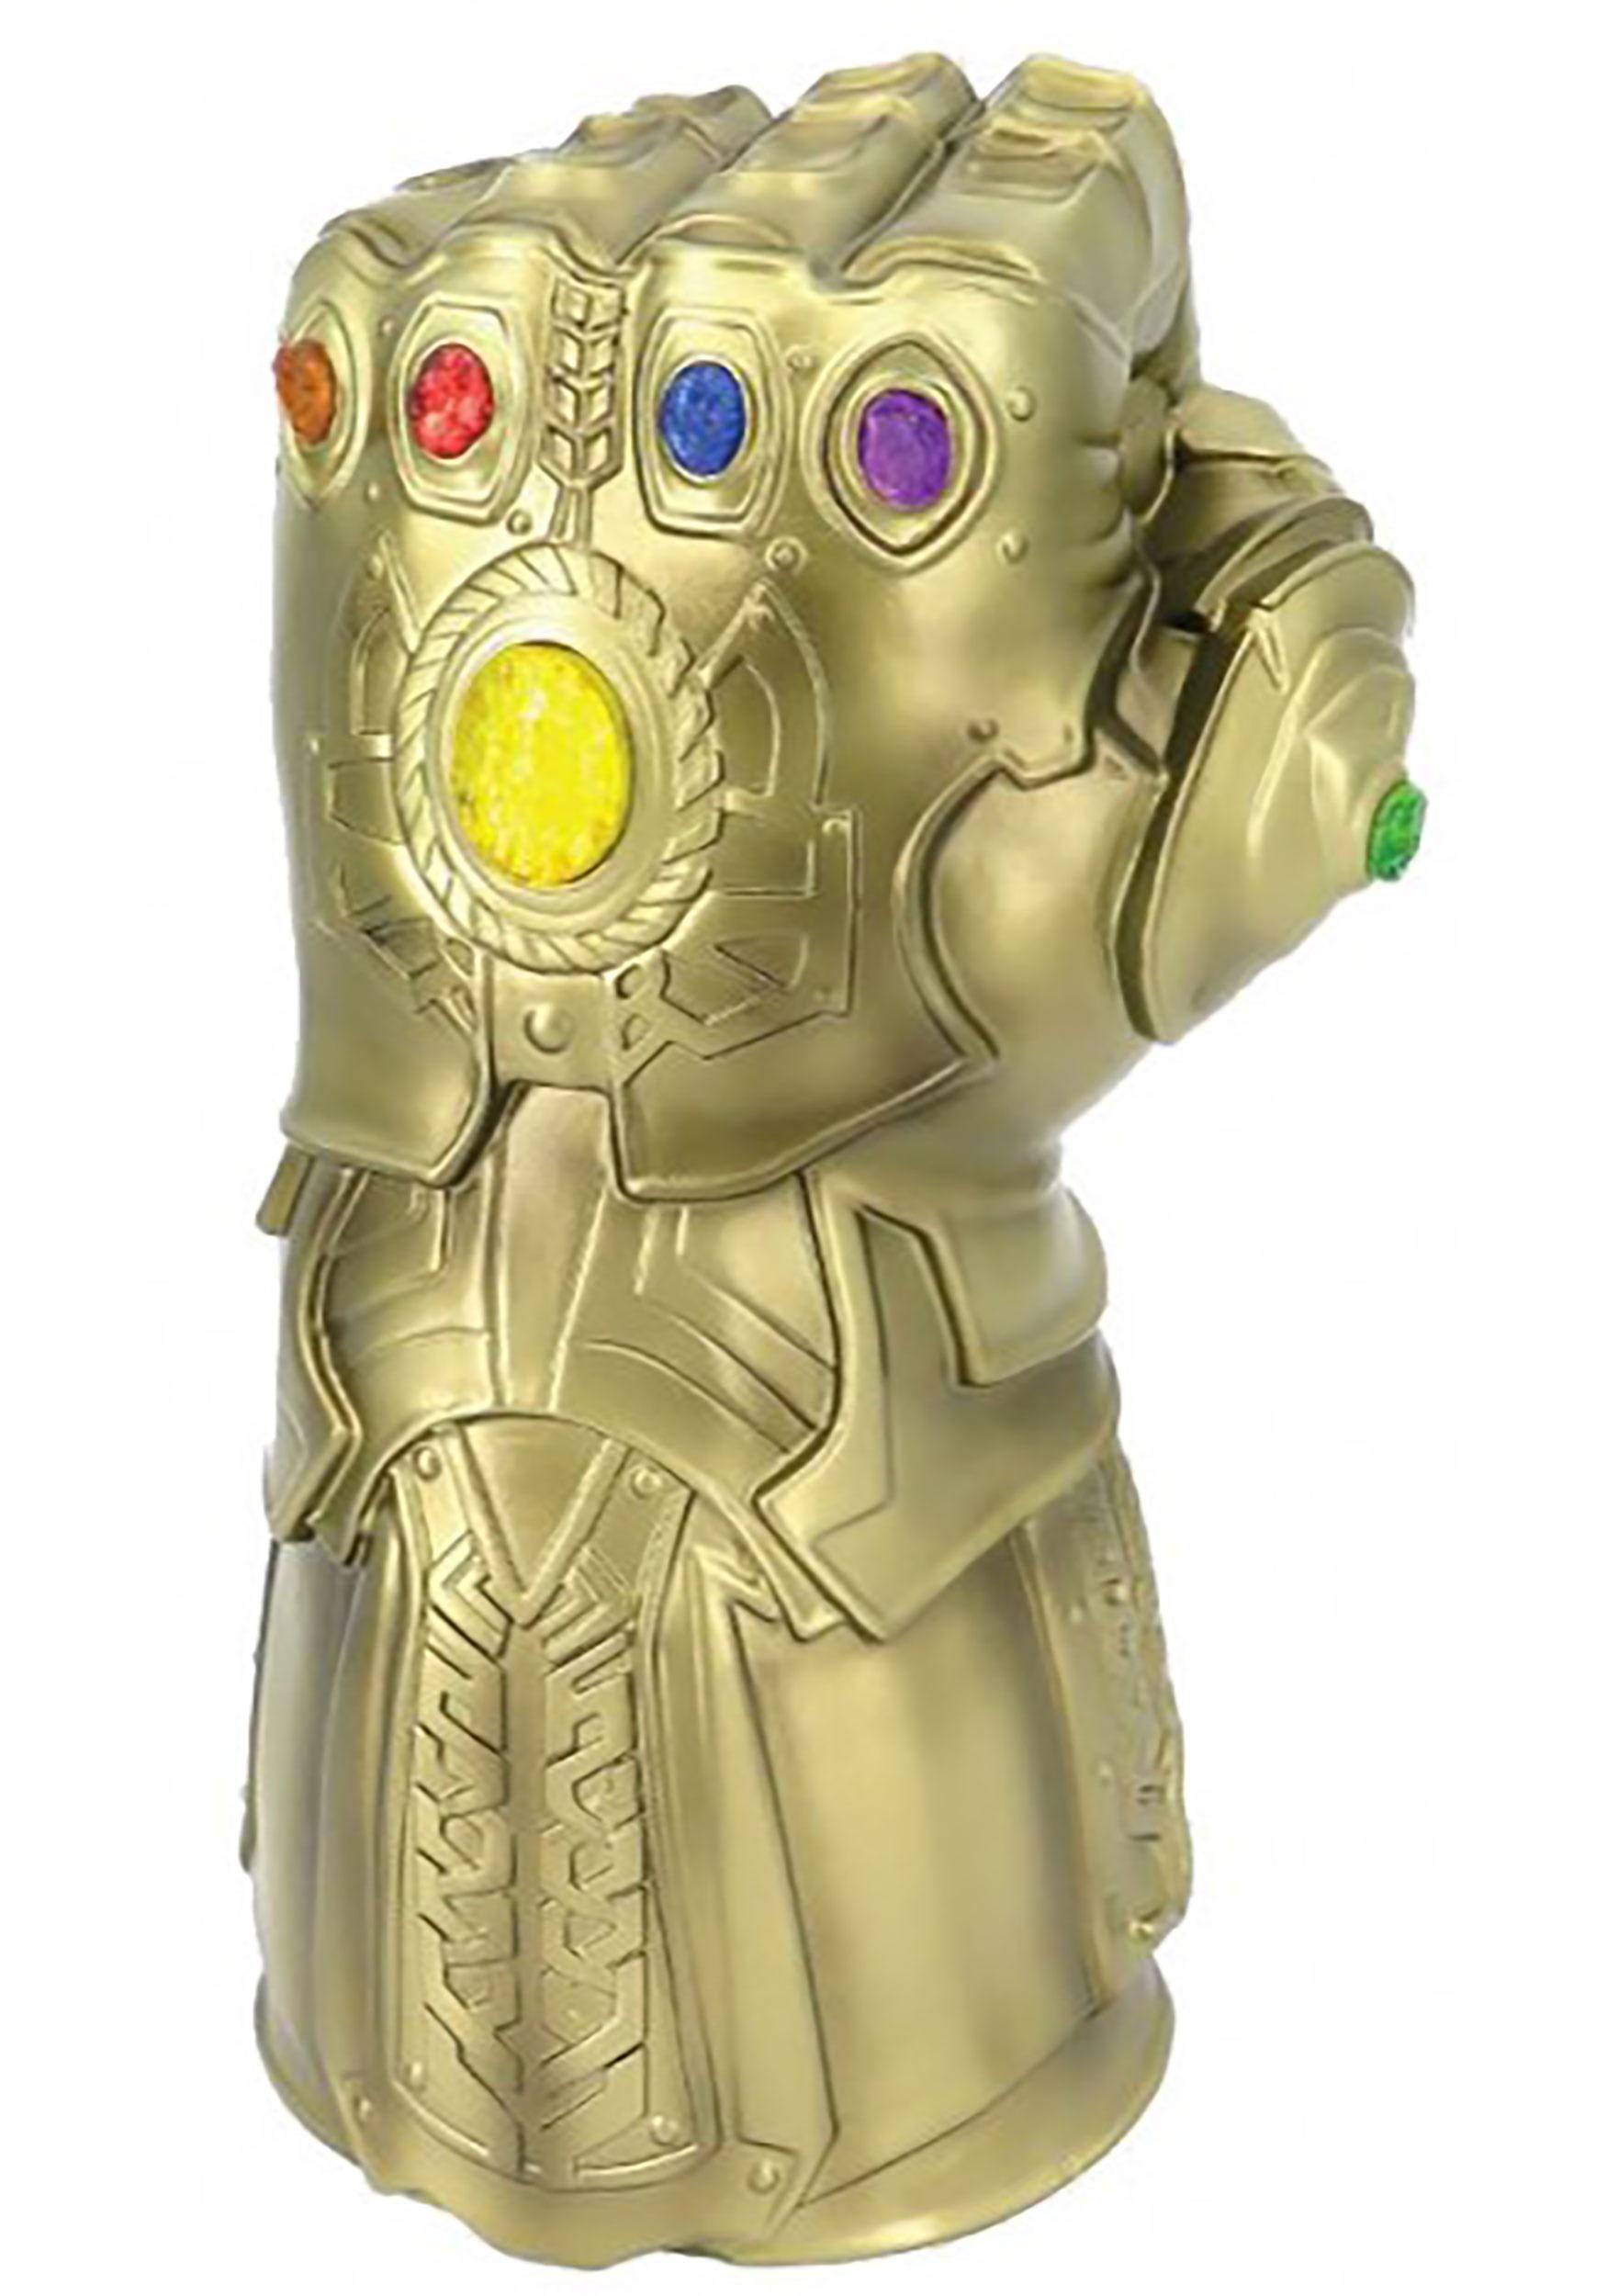 Thanos Infinity Gauntlet Coin Bank